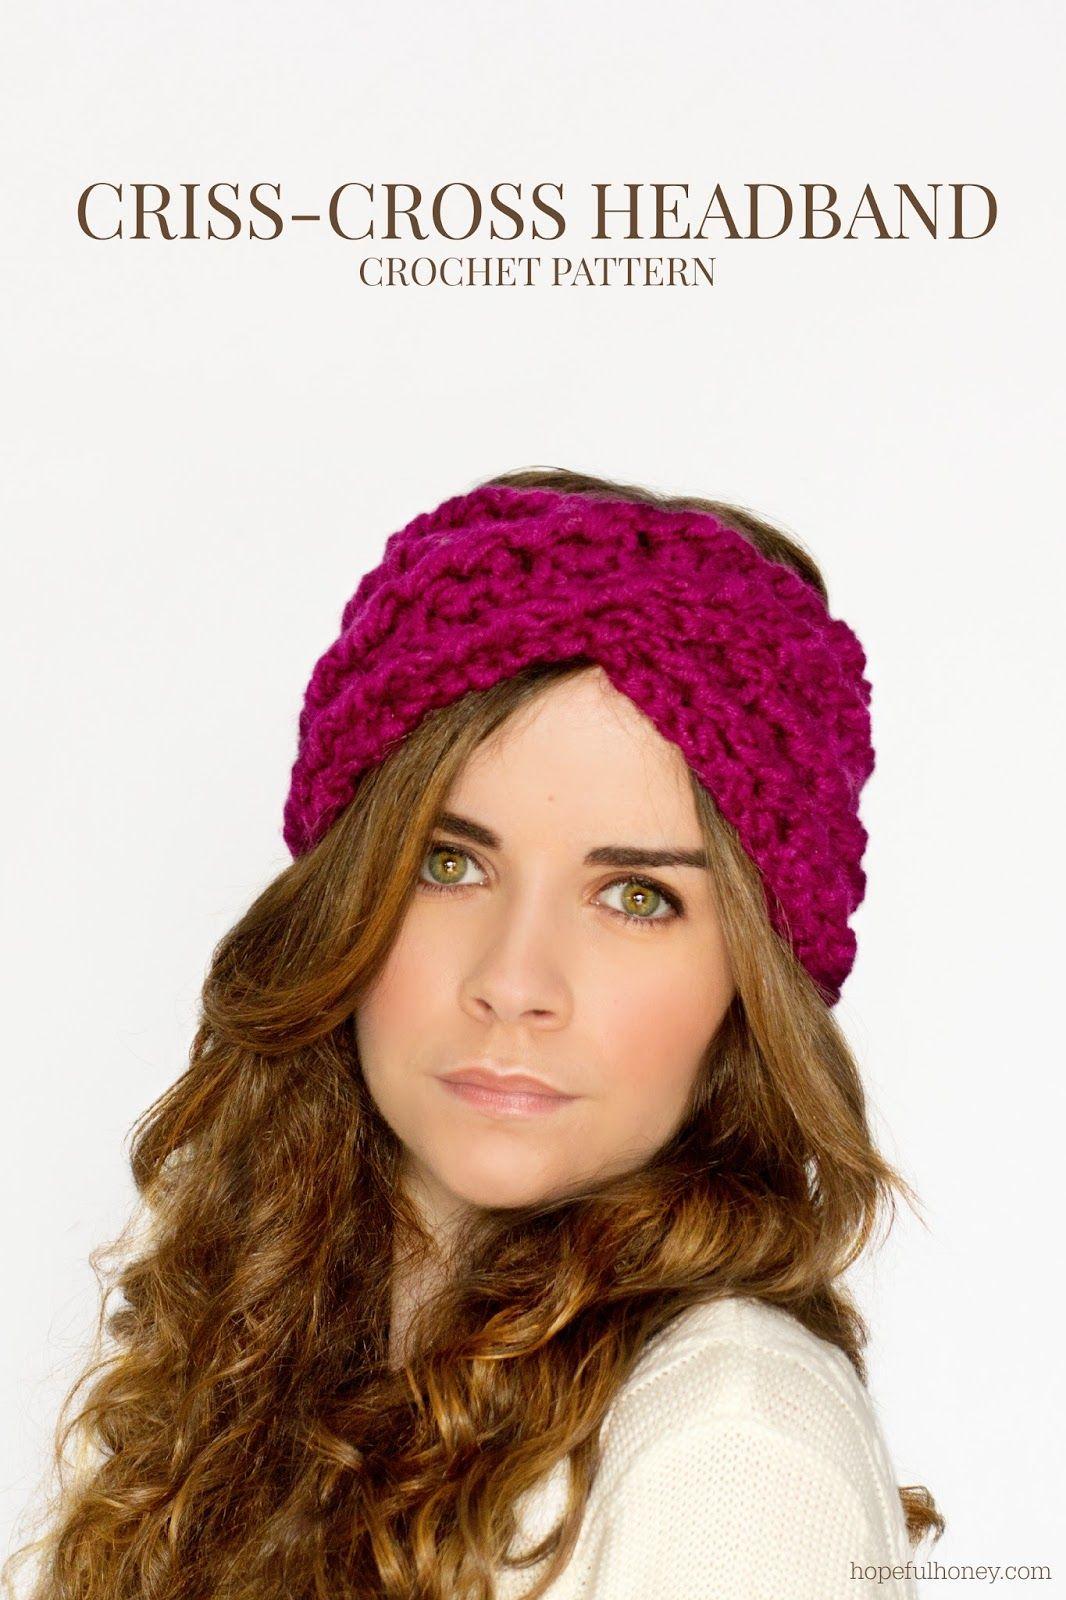 Chunky Criss-Cross Headband Crochet Pattern | Cruzado, Miel y Ganchillo